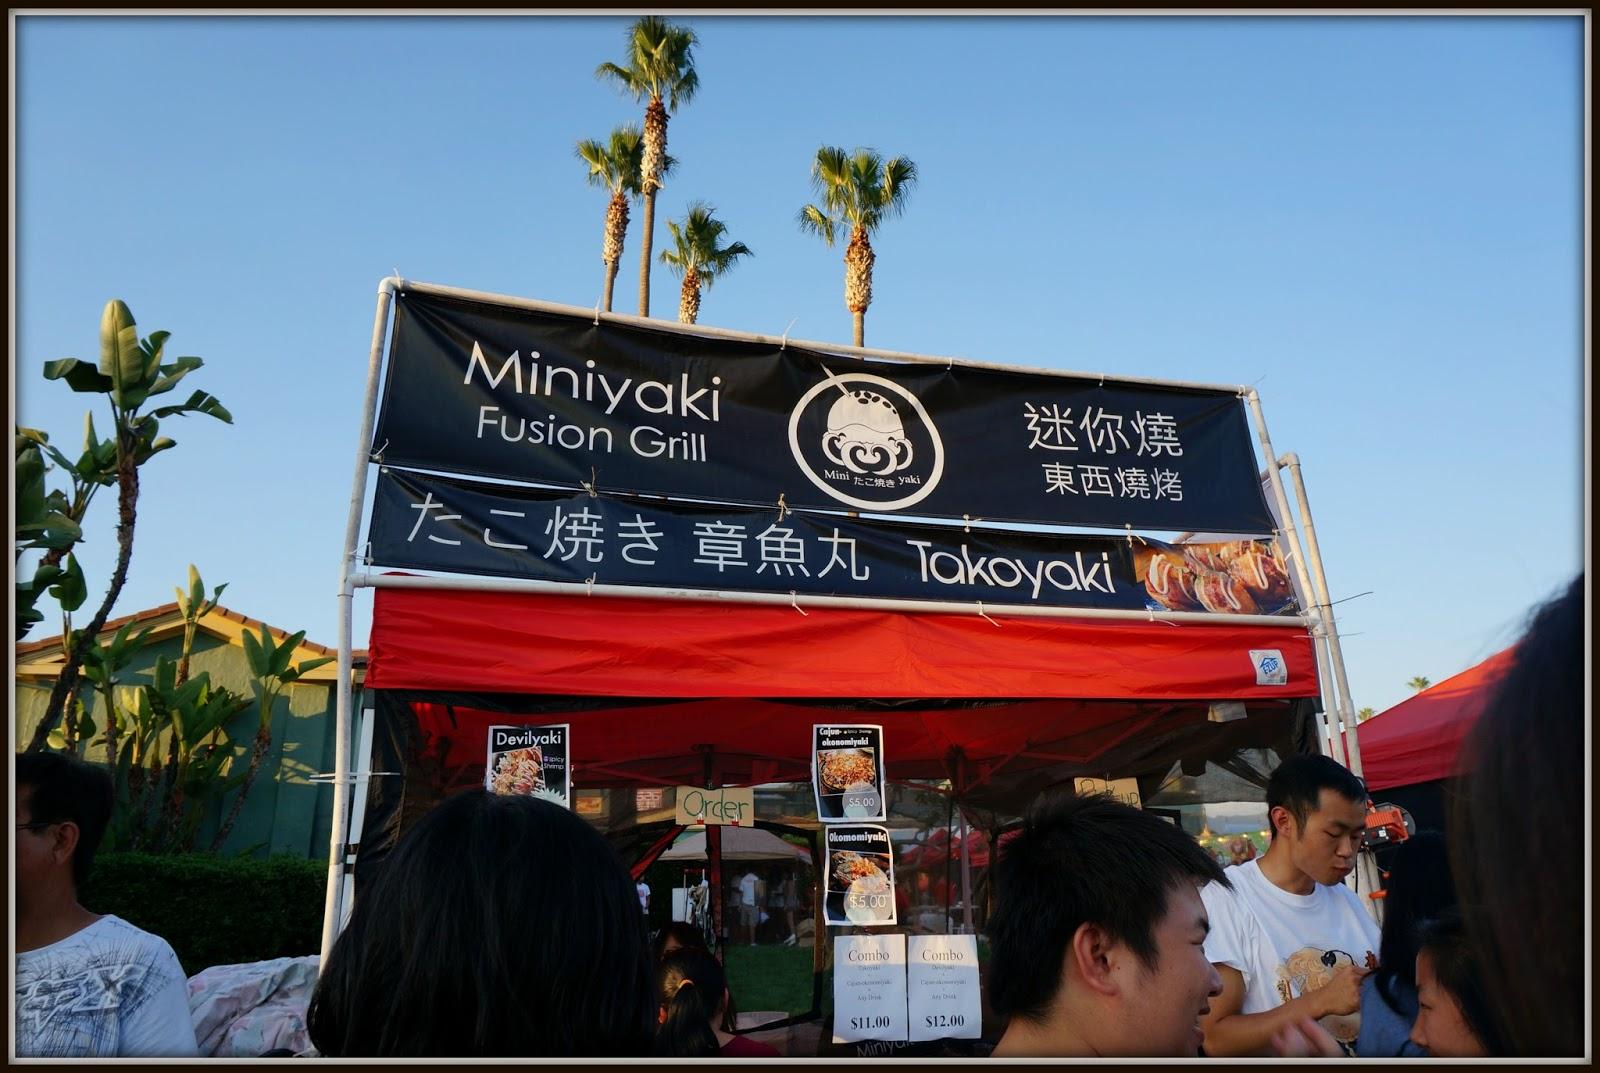 Miniyaki